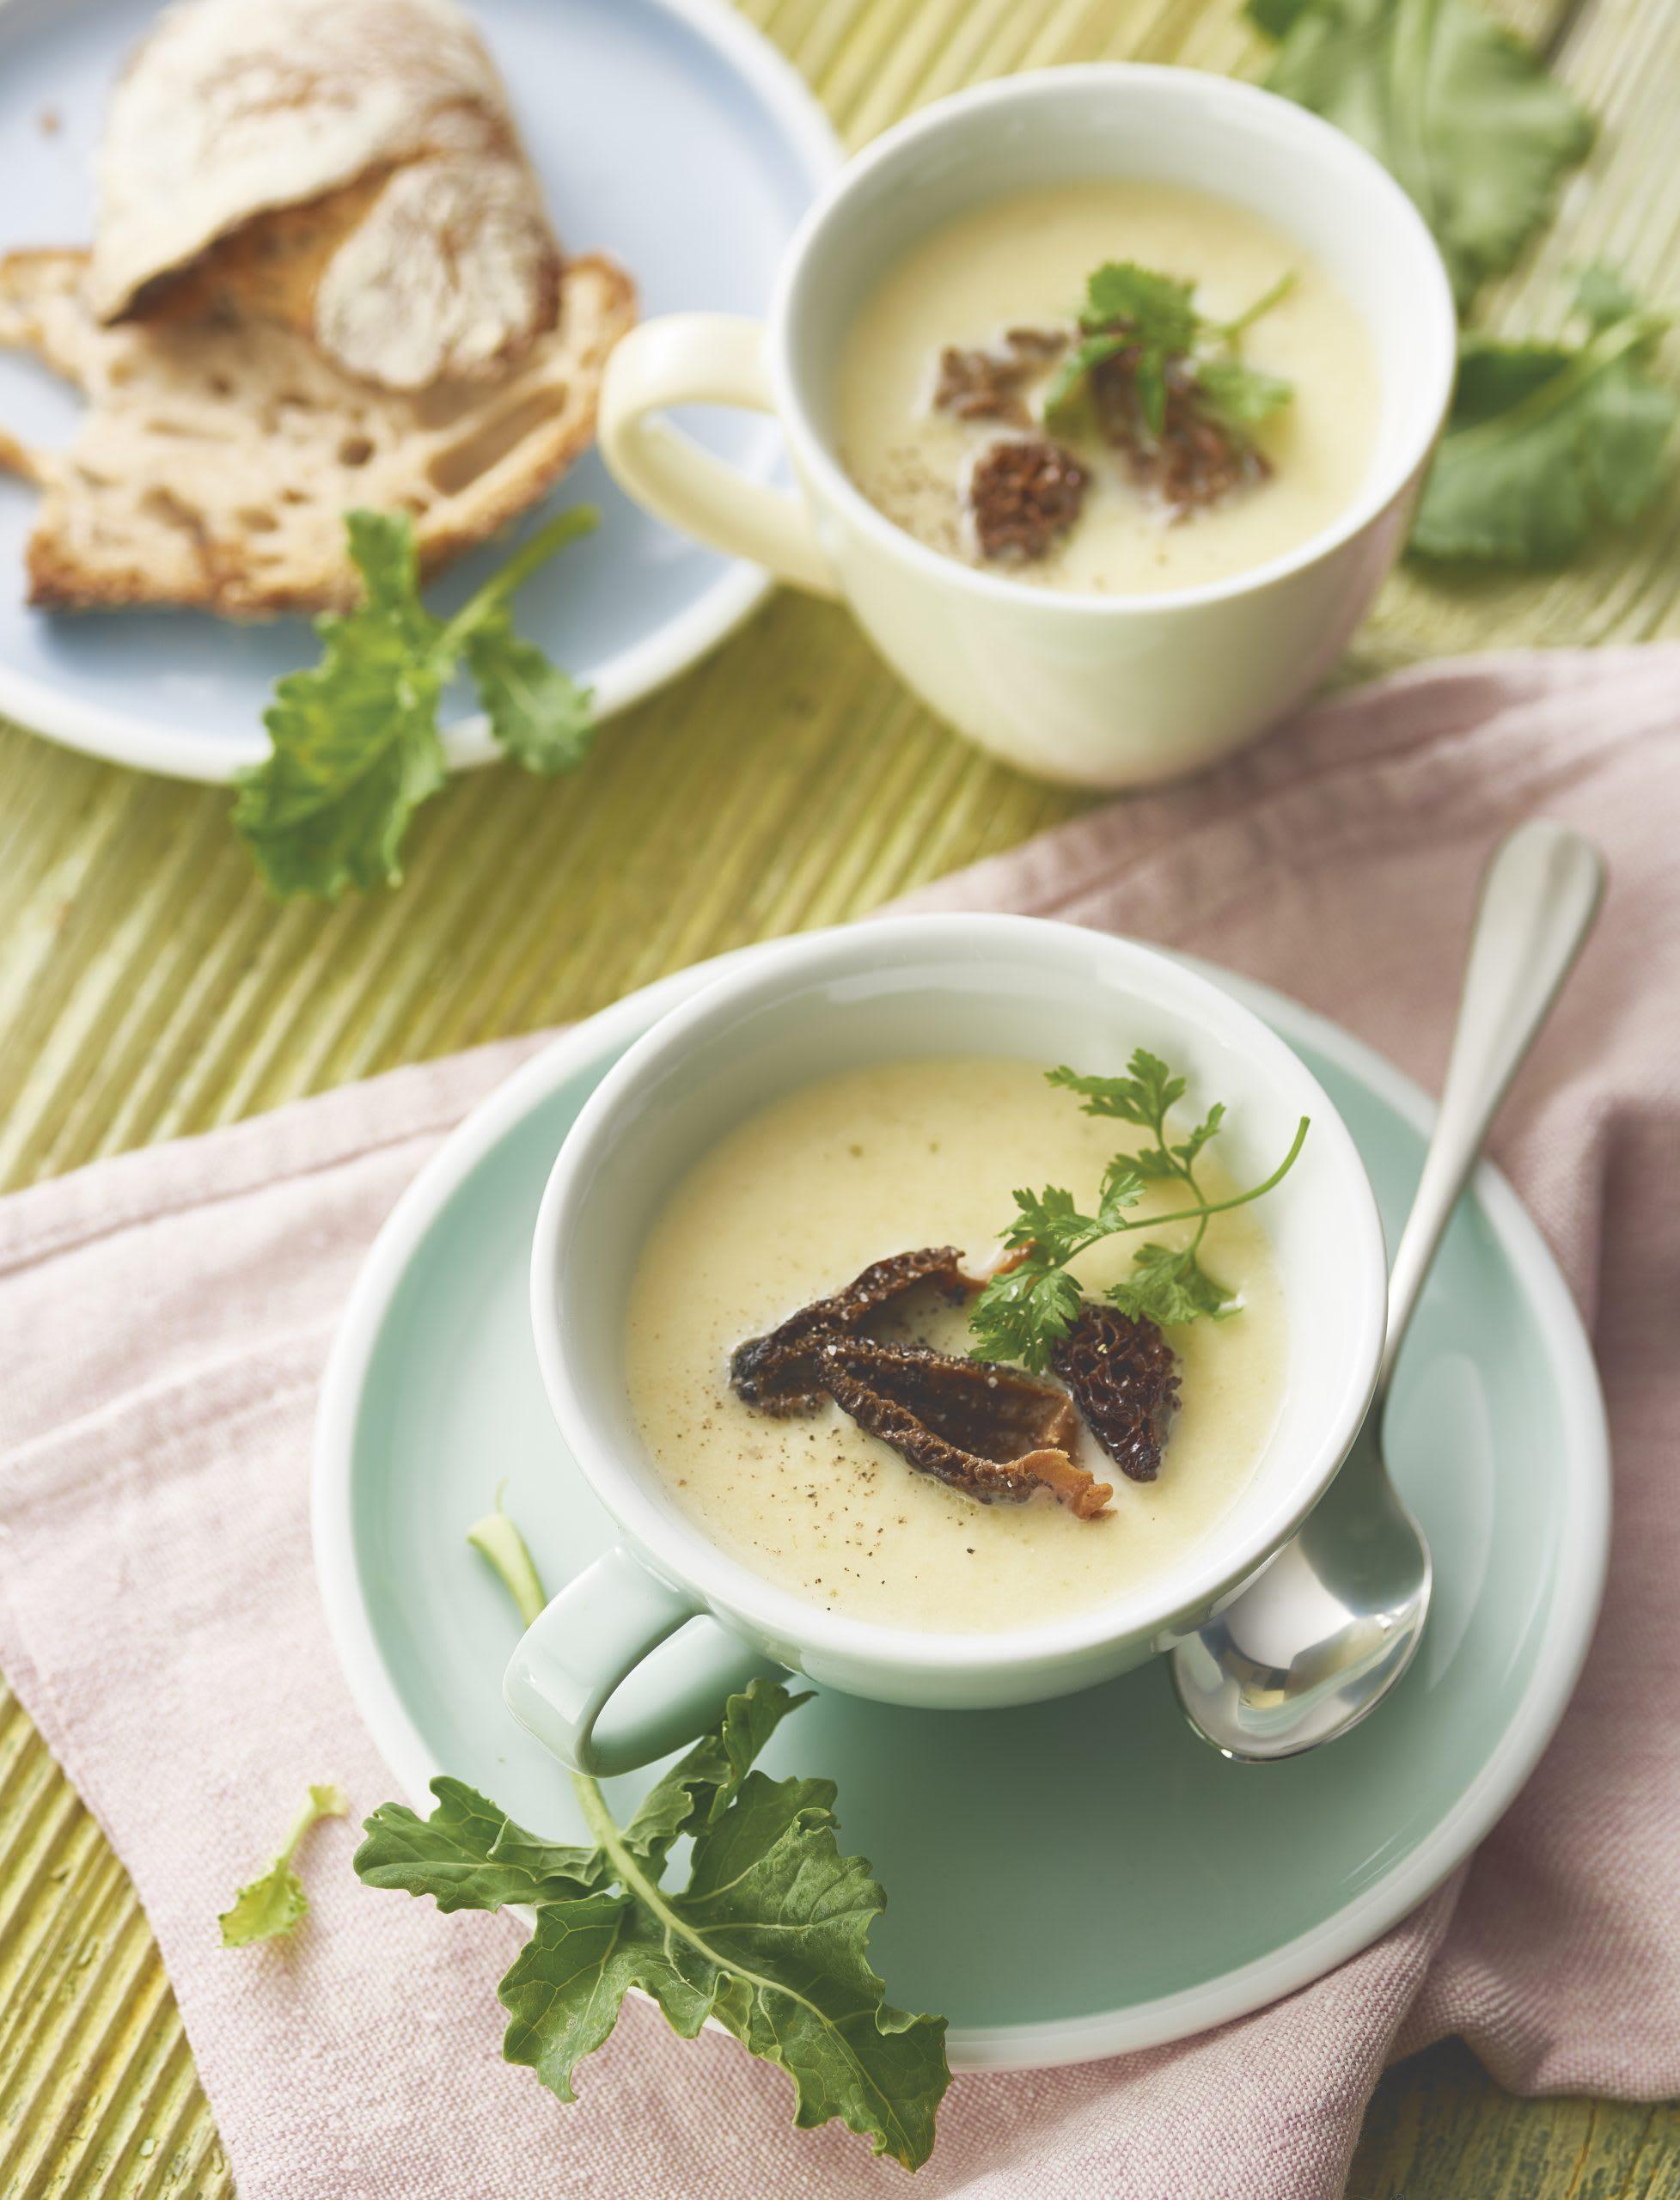 Kohlrabi-Morchel-Suppe